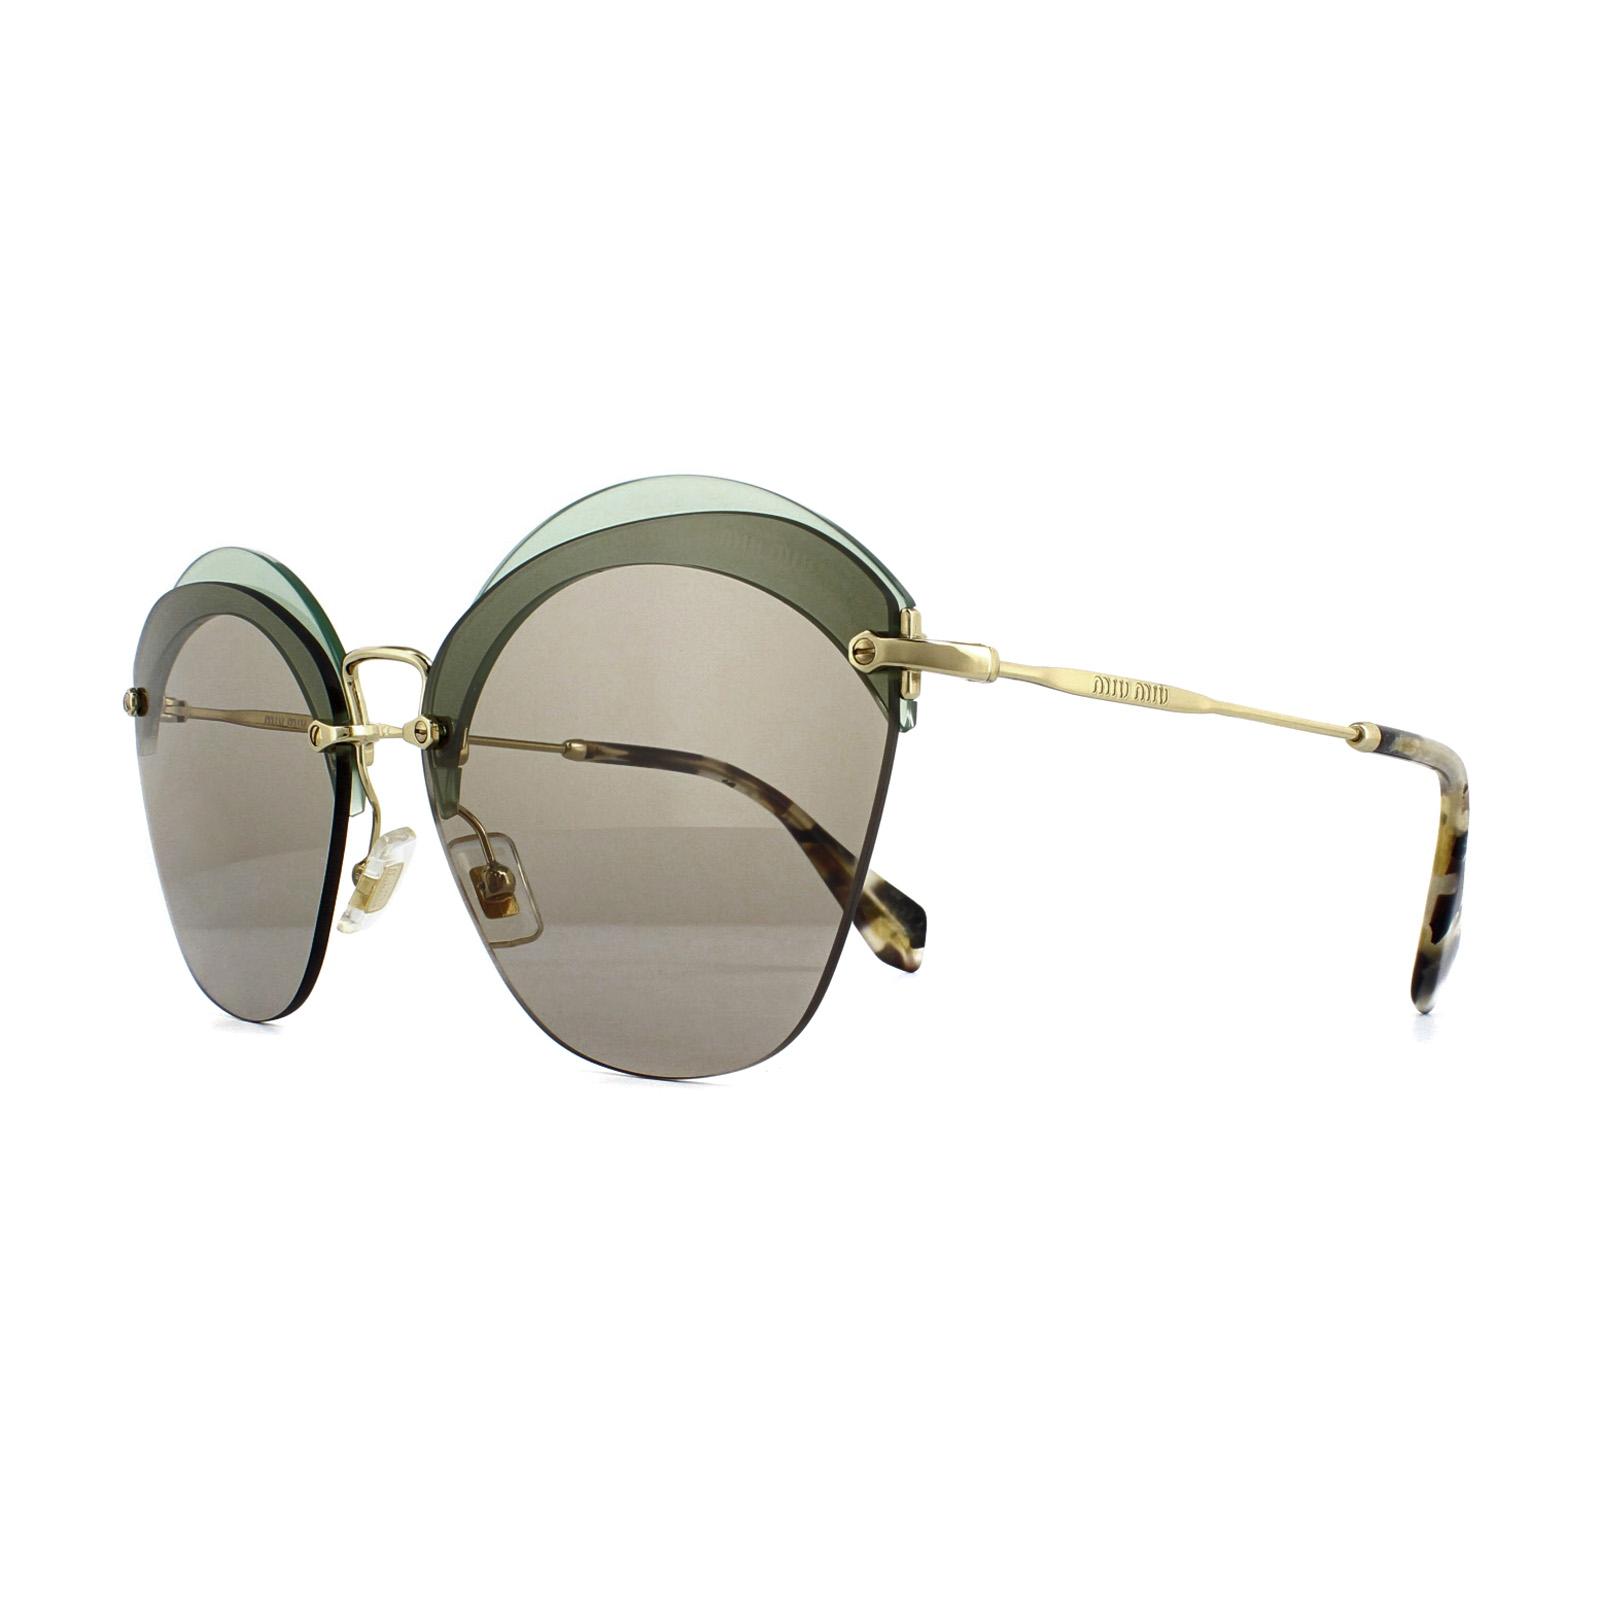 Bestseller einkaufen neue Kollektion guter Verkauf Details zu Miu Miu Sonnenbrille MU 53SS VX15J2 Grün & Gold HellBraun